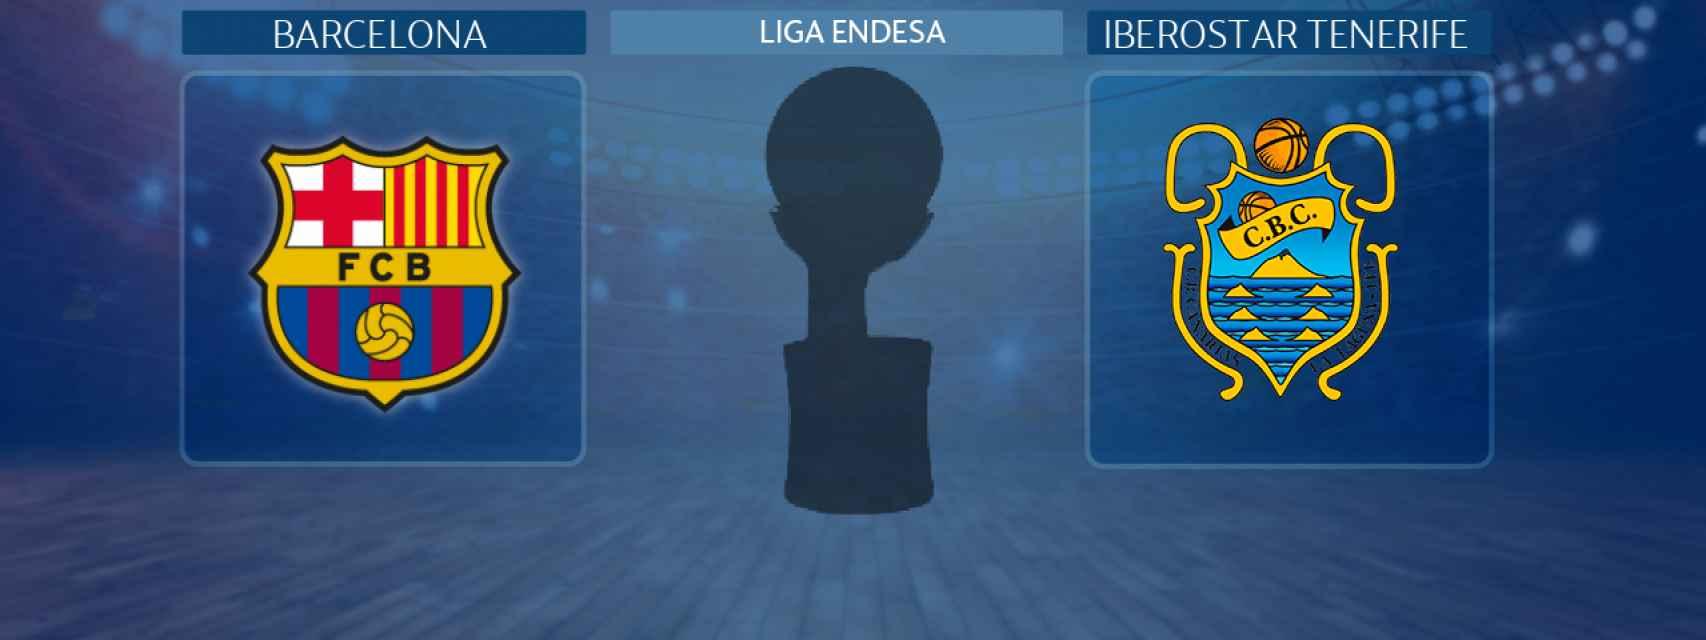 Barcelona - Iberostar Tenerife, partido de la Liga Endesa